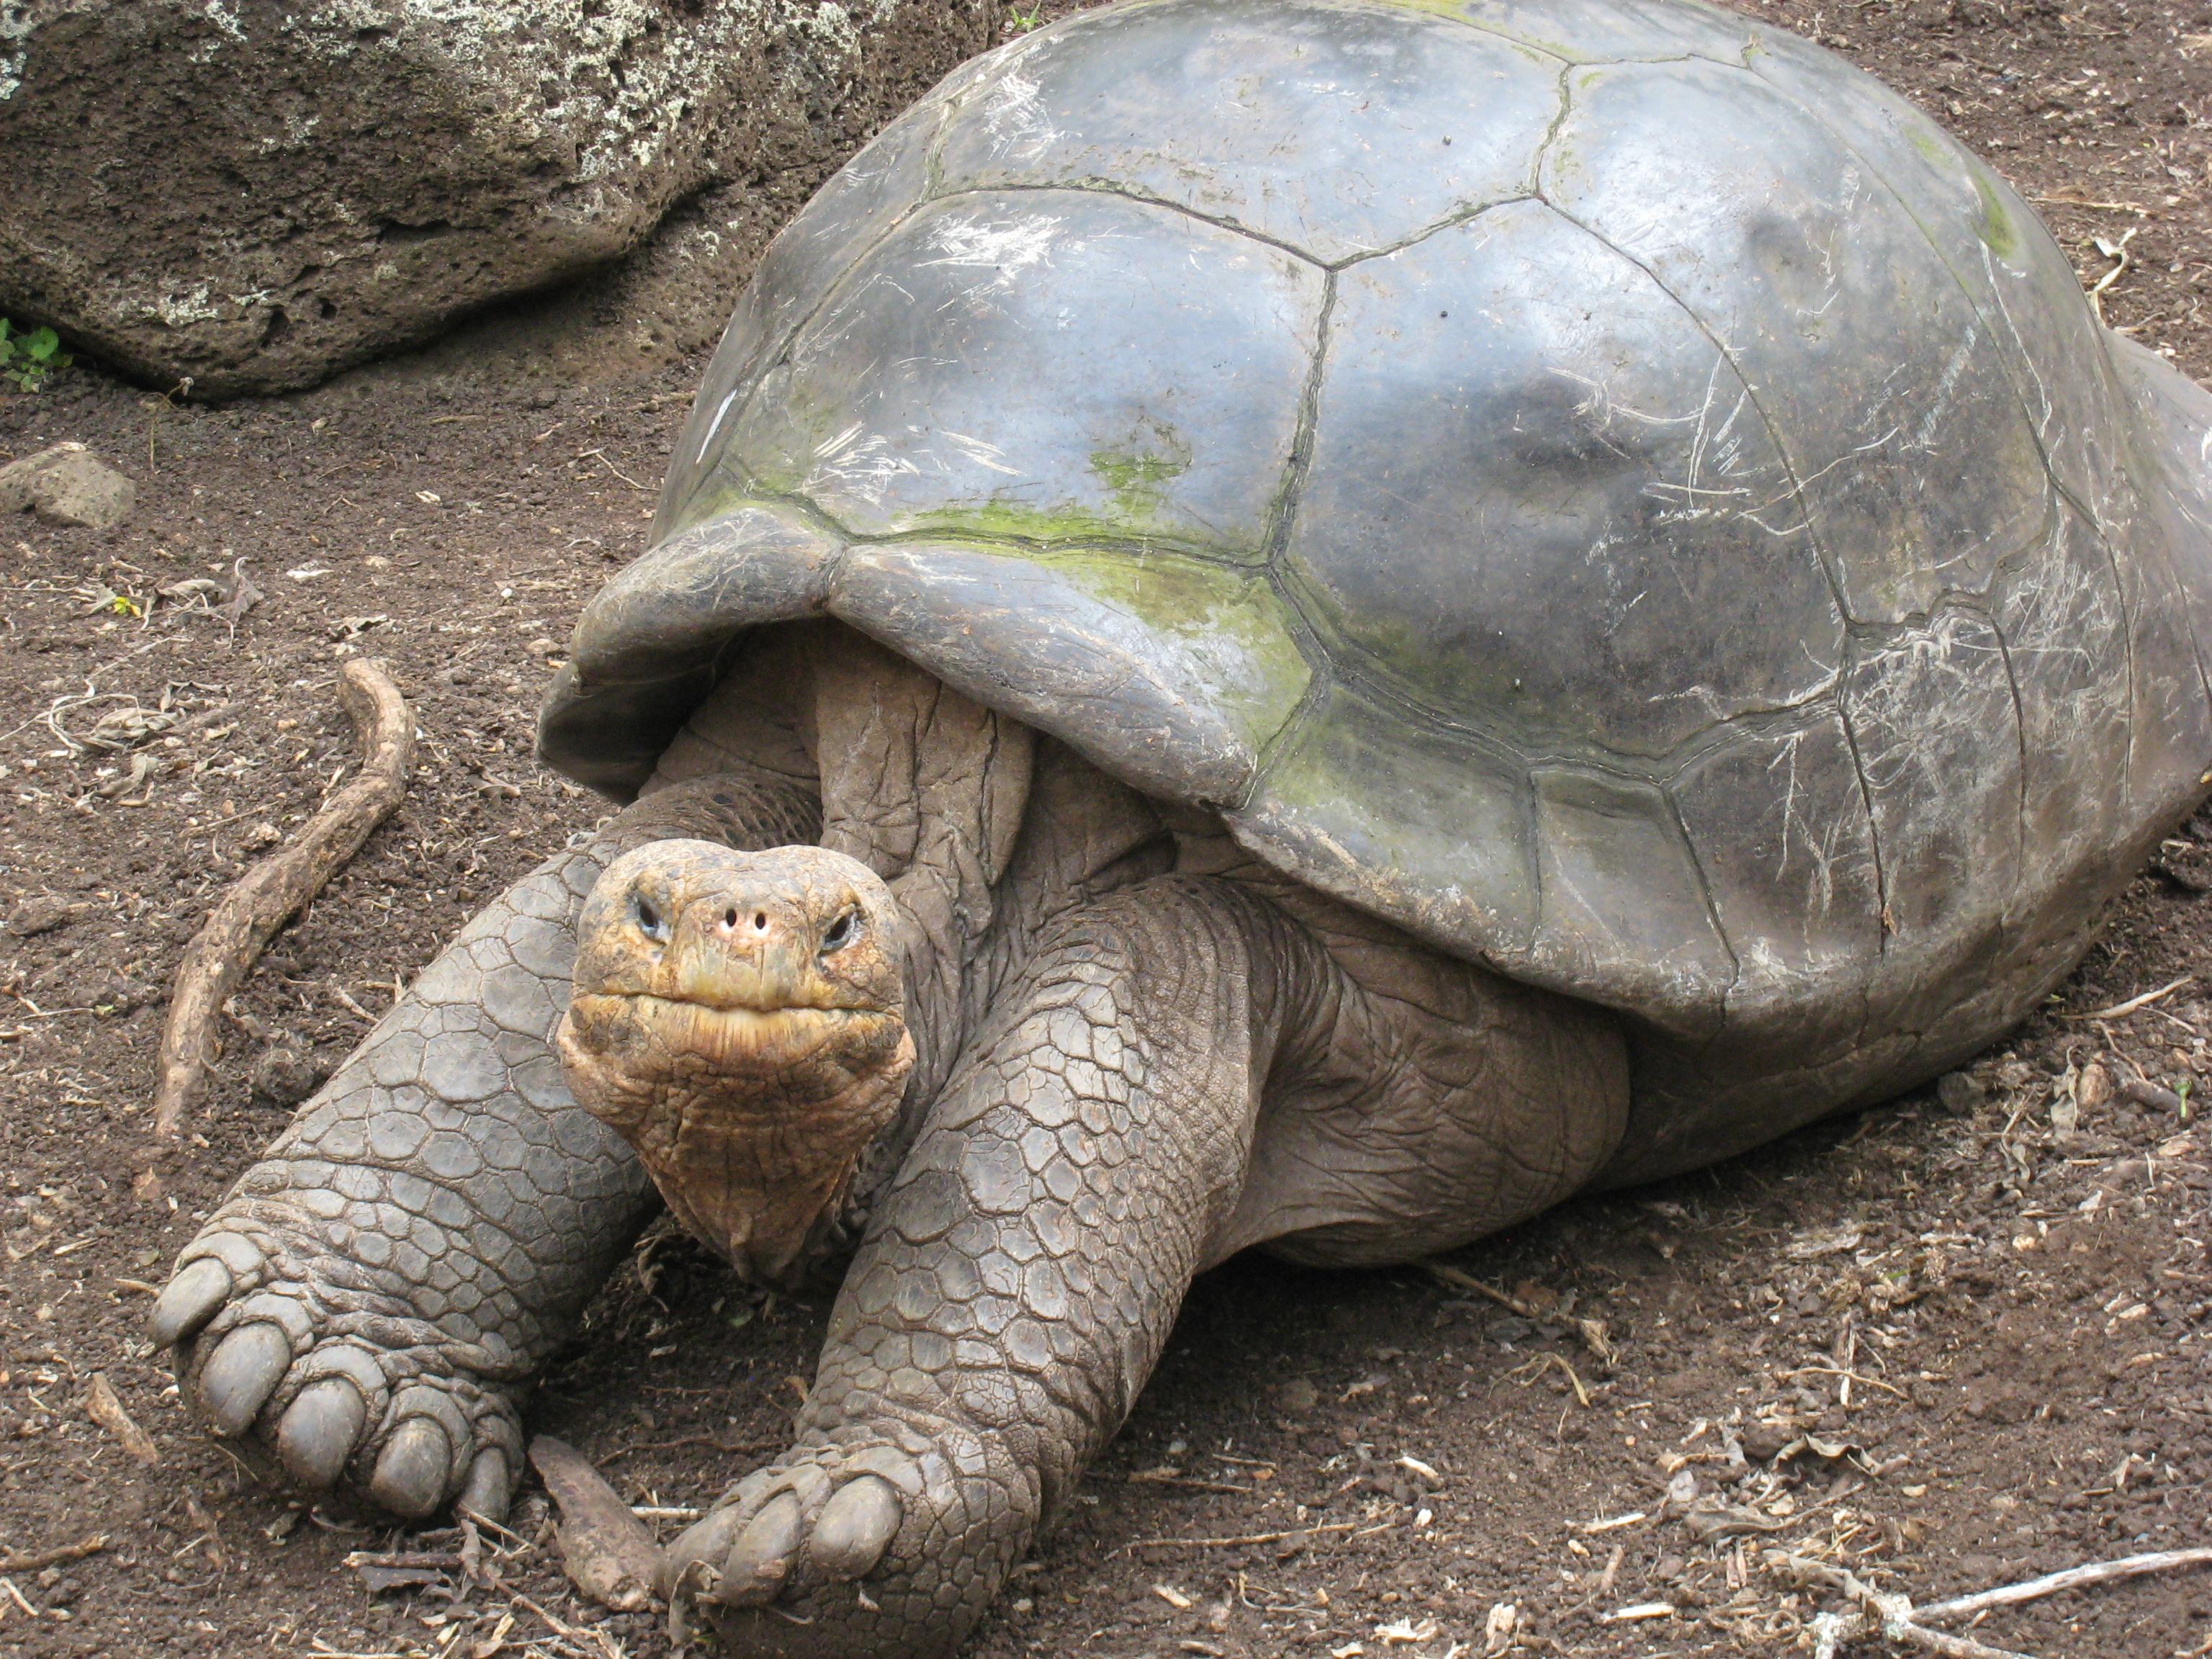 Old turtle photo